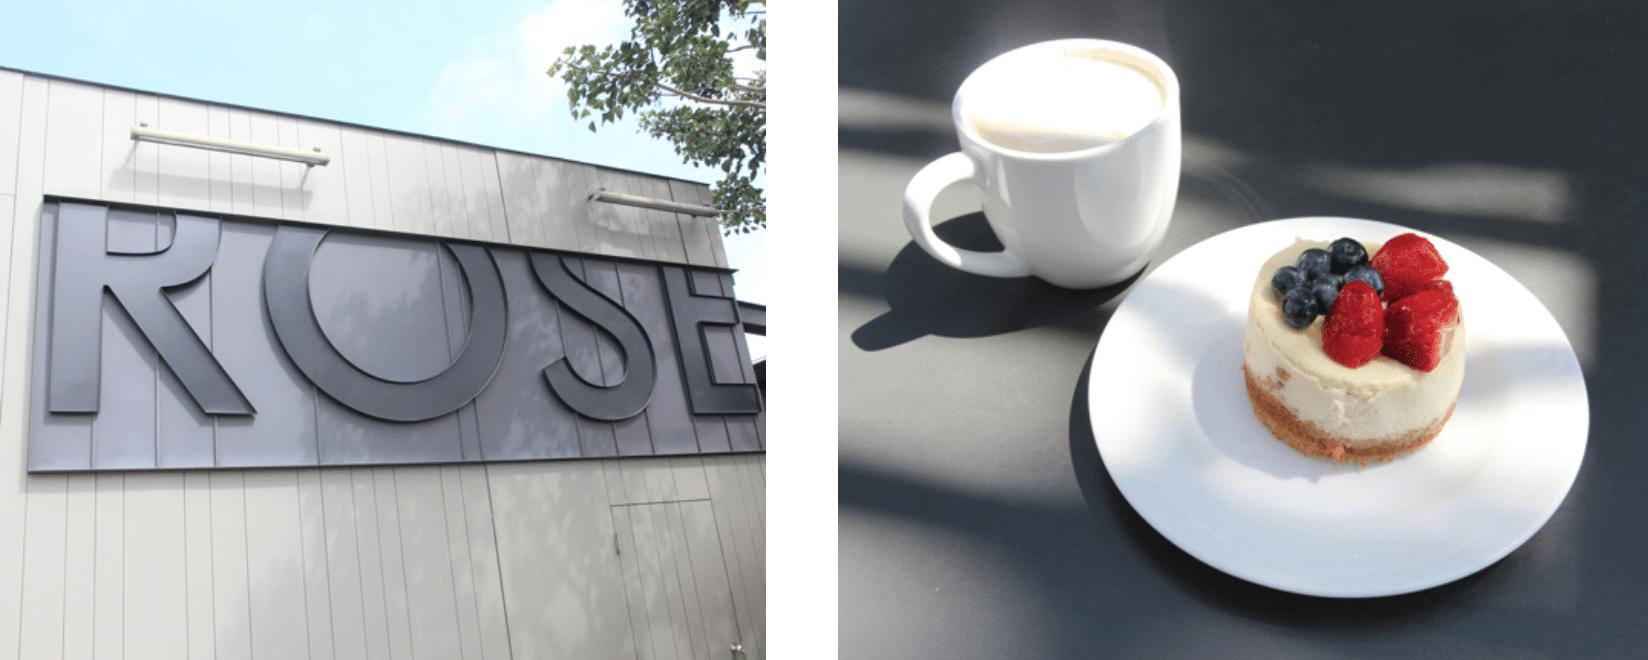 Rose Cafe Los Angeles